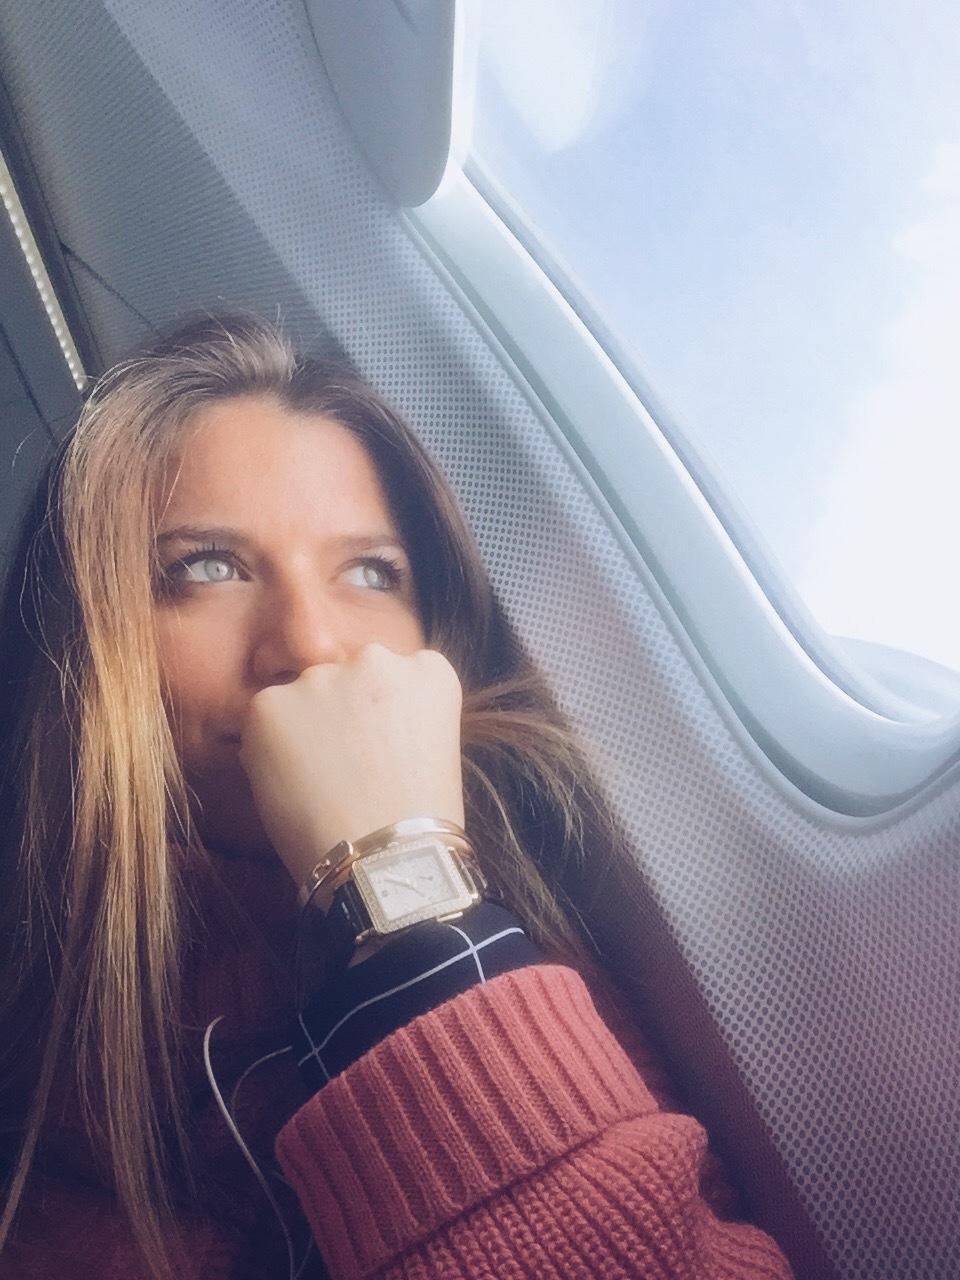 dusseldorf to geneva flight